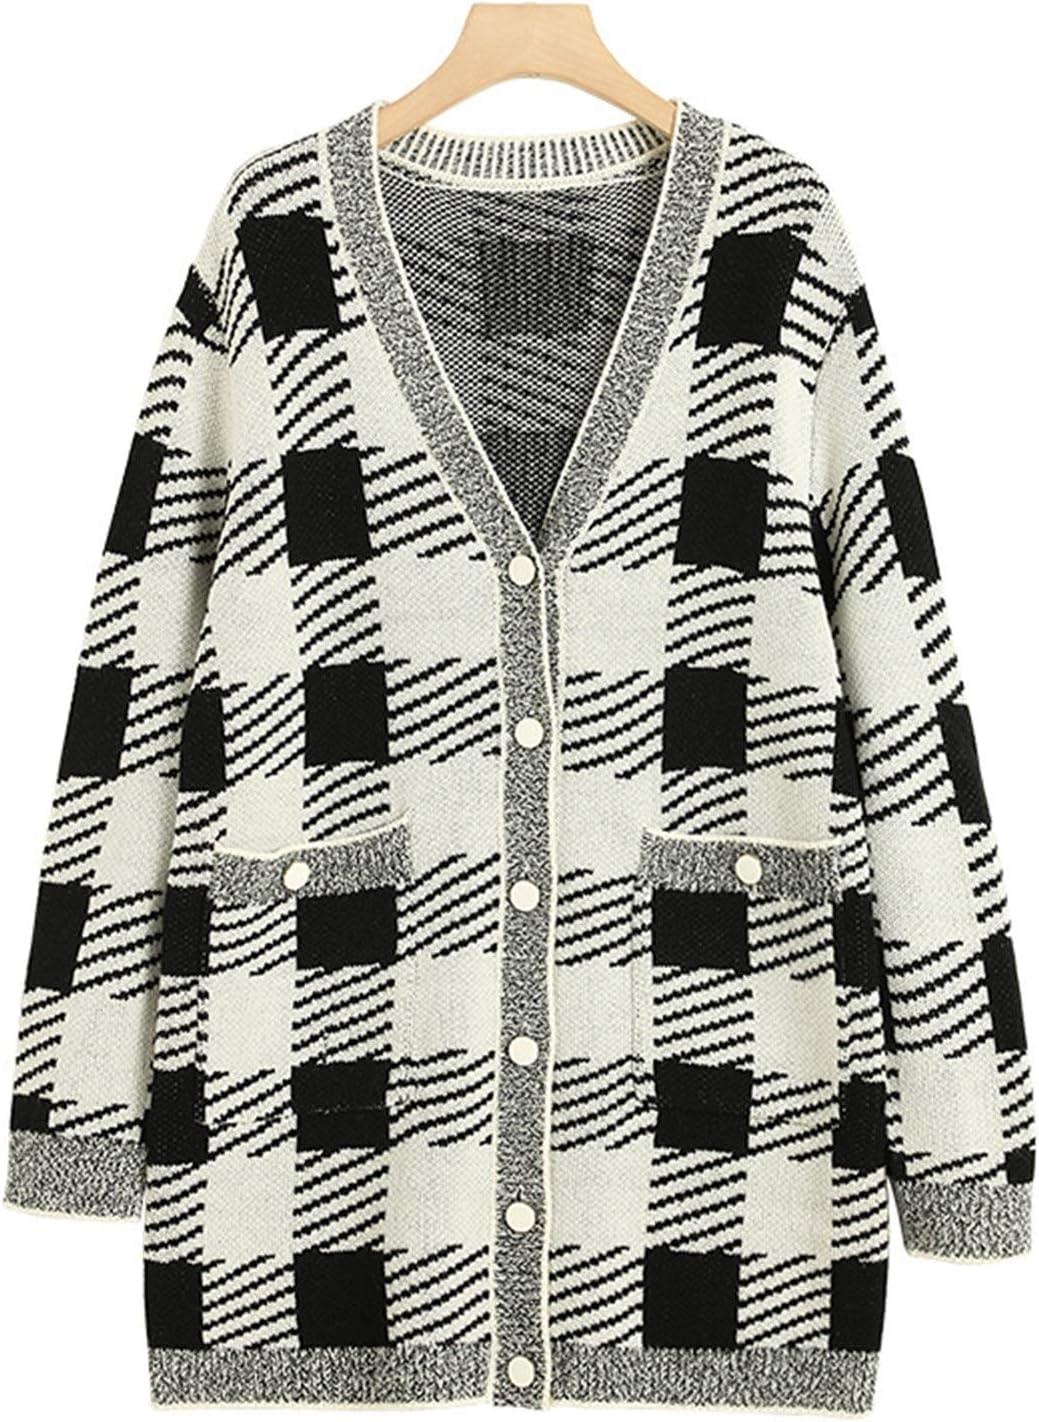 KEJI Beautiful Plaid Cardigan Jackets Autumn Raleigh Mall Thick Women Max 55% OFF Sweater